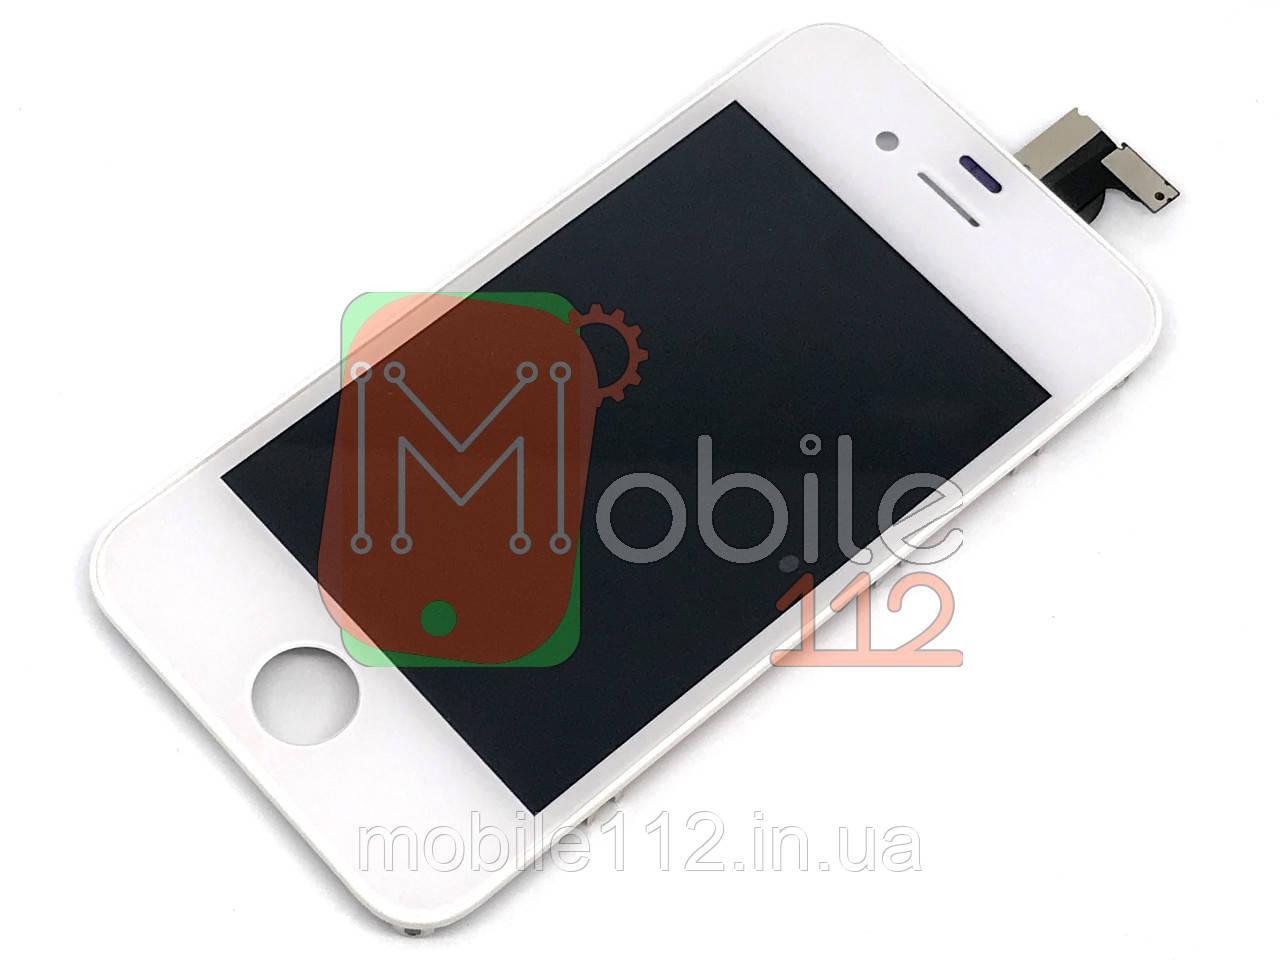 Экран (дисплей) Apple iPhone 4 + тачскрин белый AAA